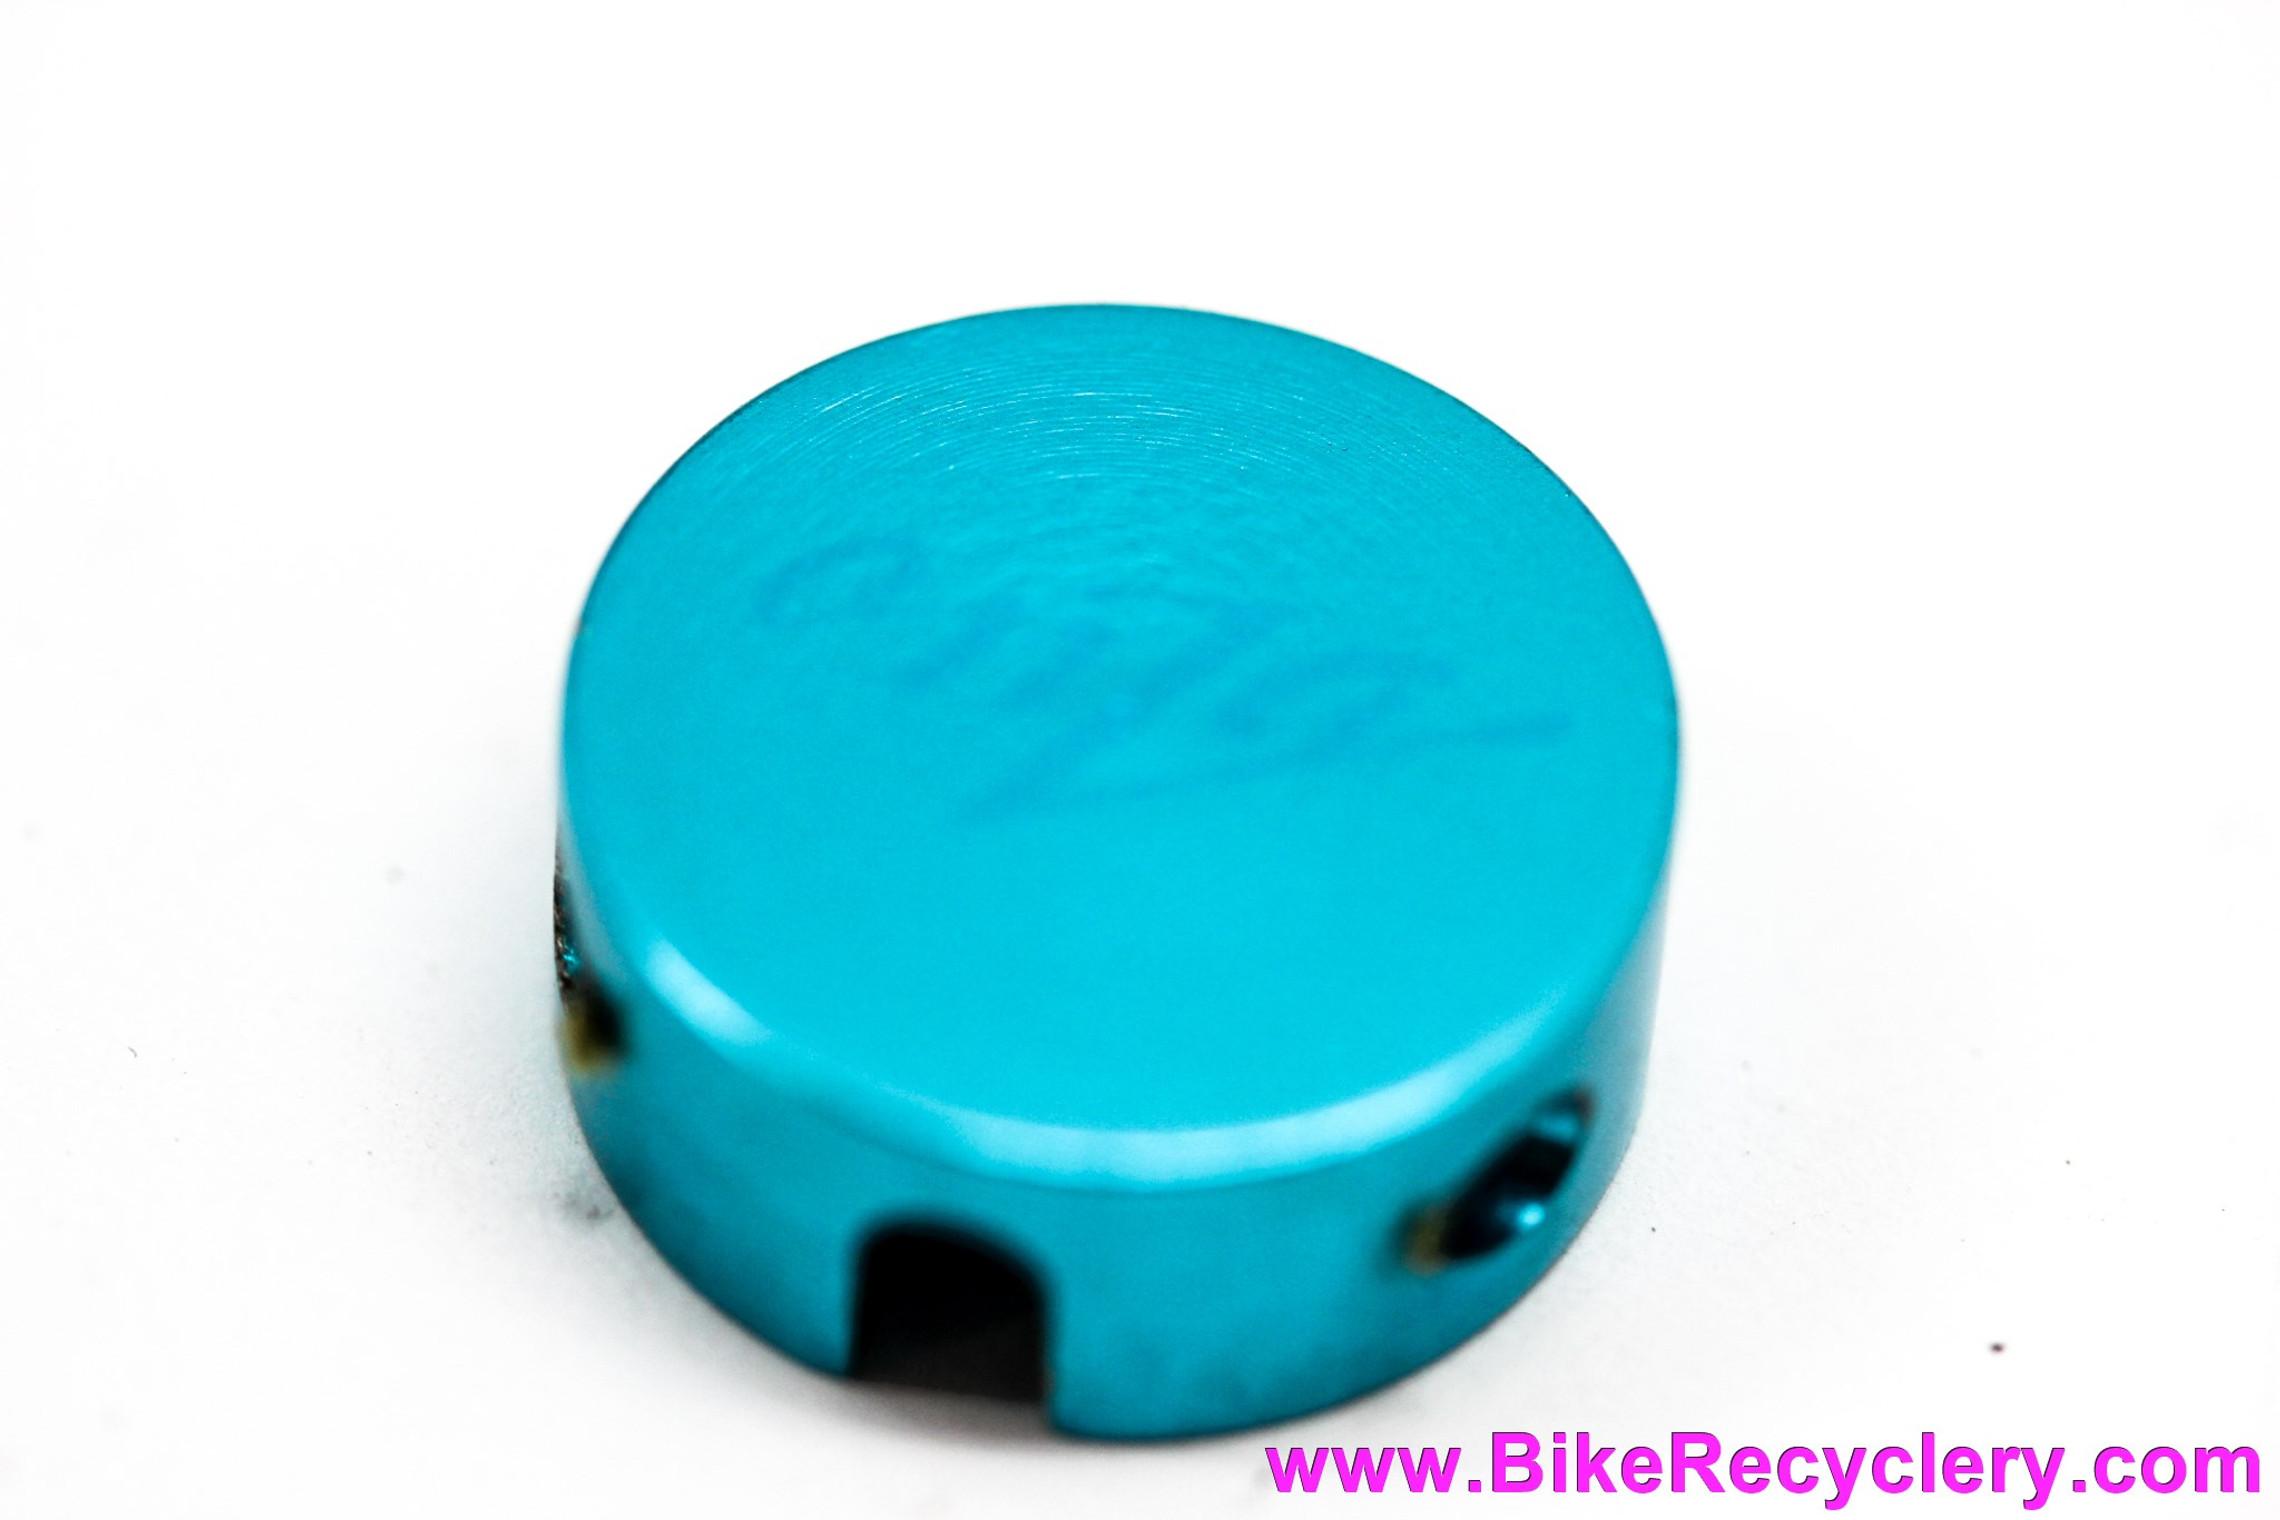 NOS Retro Onza Chill Pills In Turquoise NIB